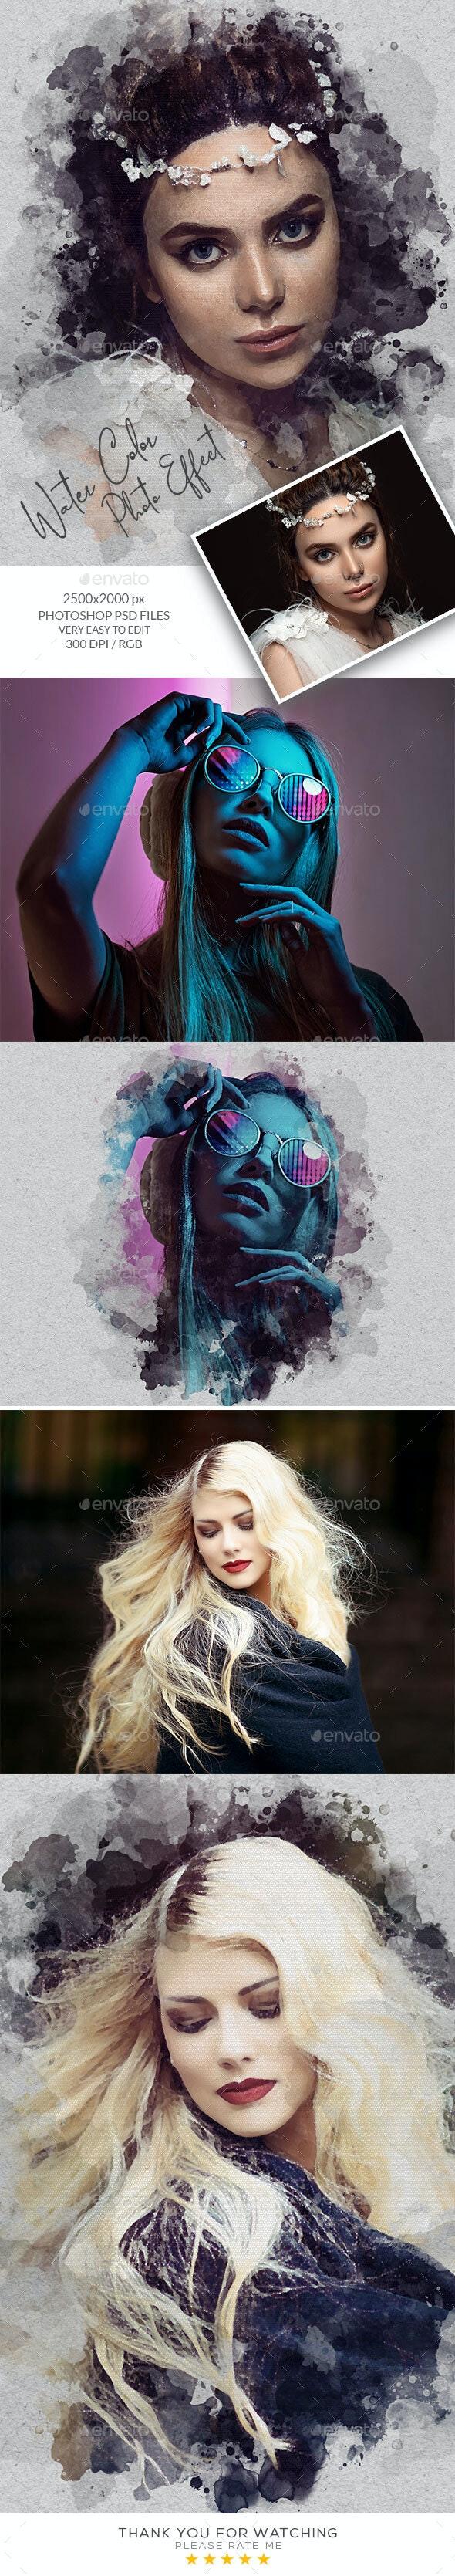 Watercolor Artistic Photo Template - Artistic Photo Templates